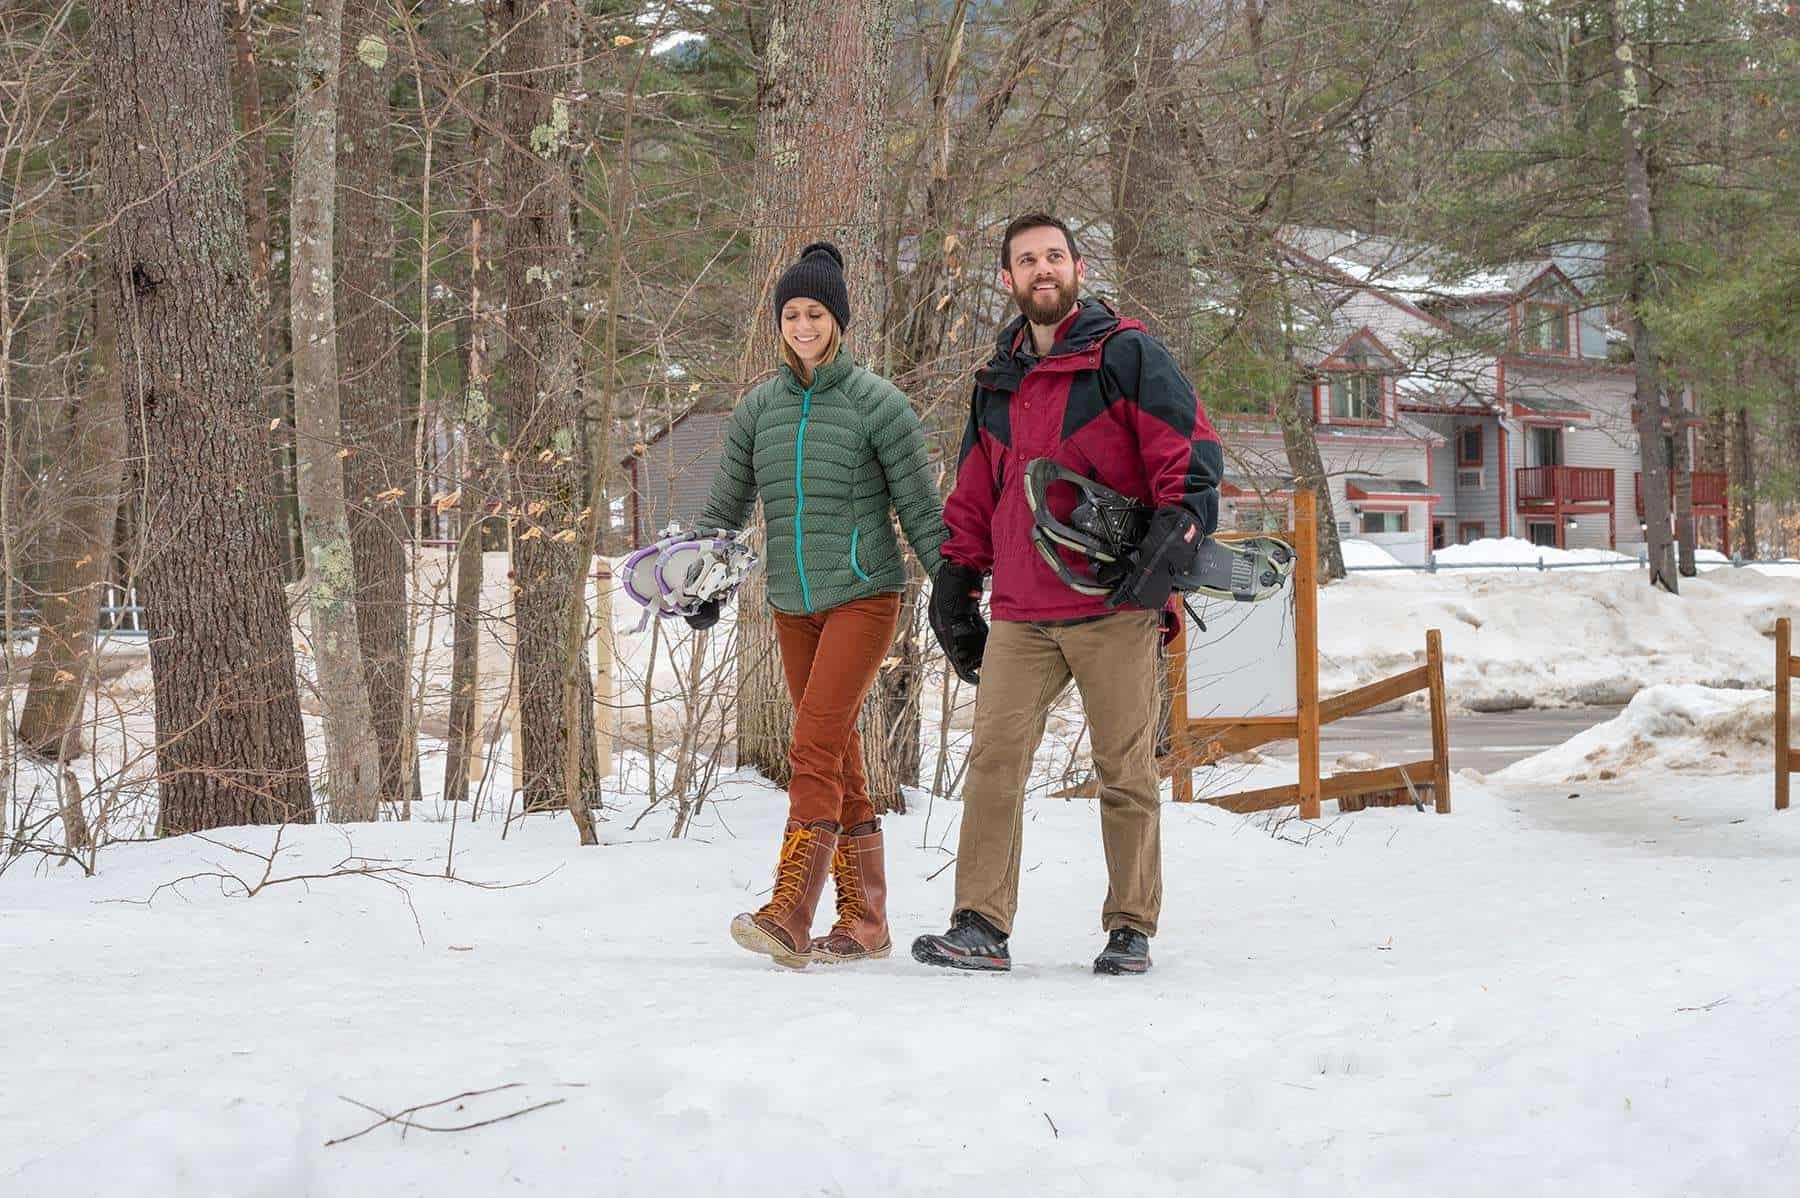 Winter Snowshoe